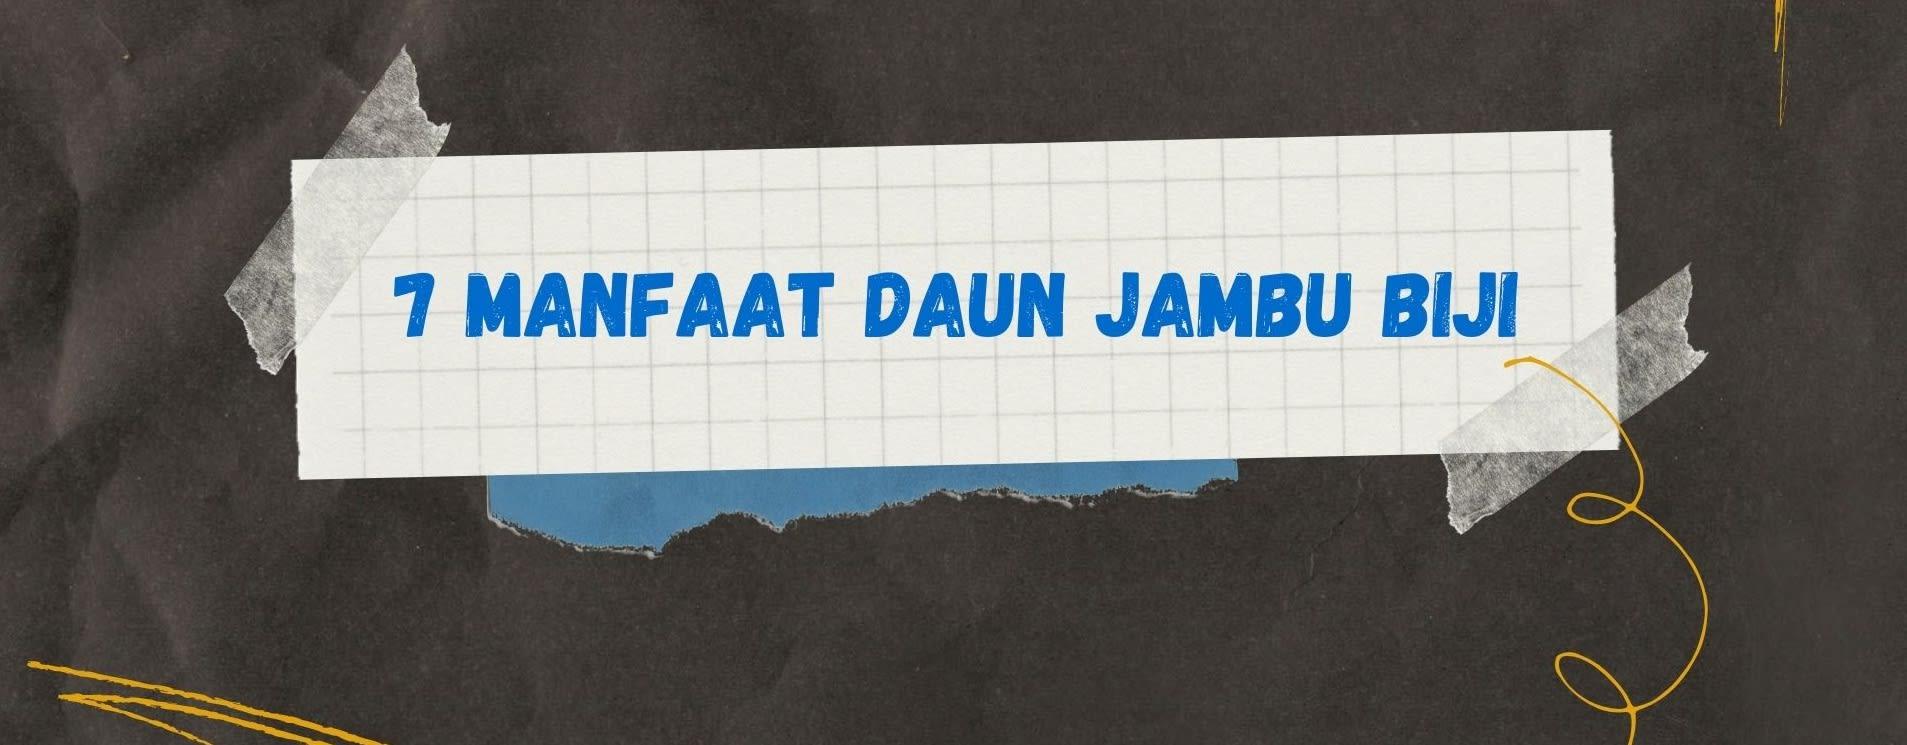 7 Manfaat Daun Jambu Biji scx5t9